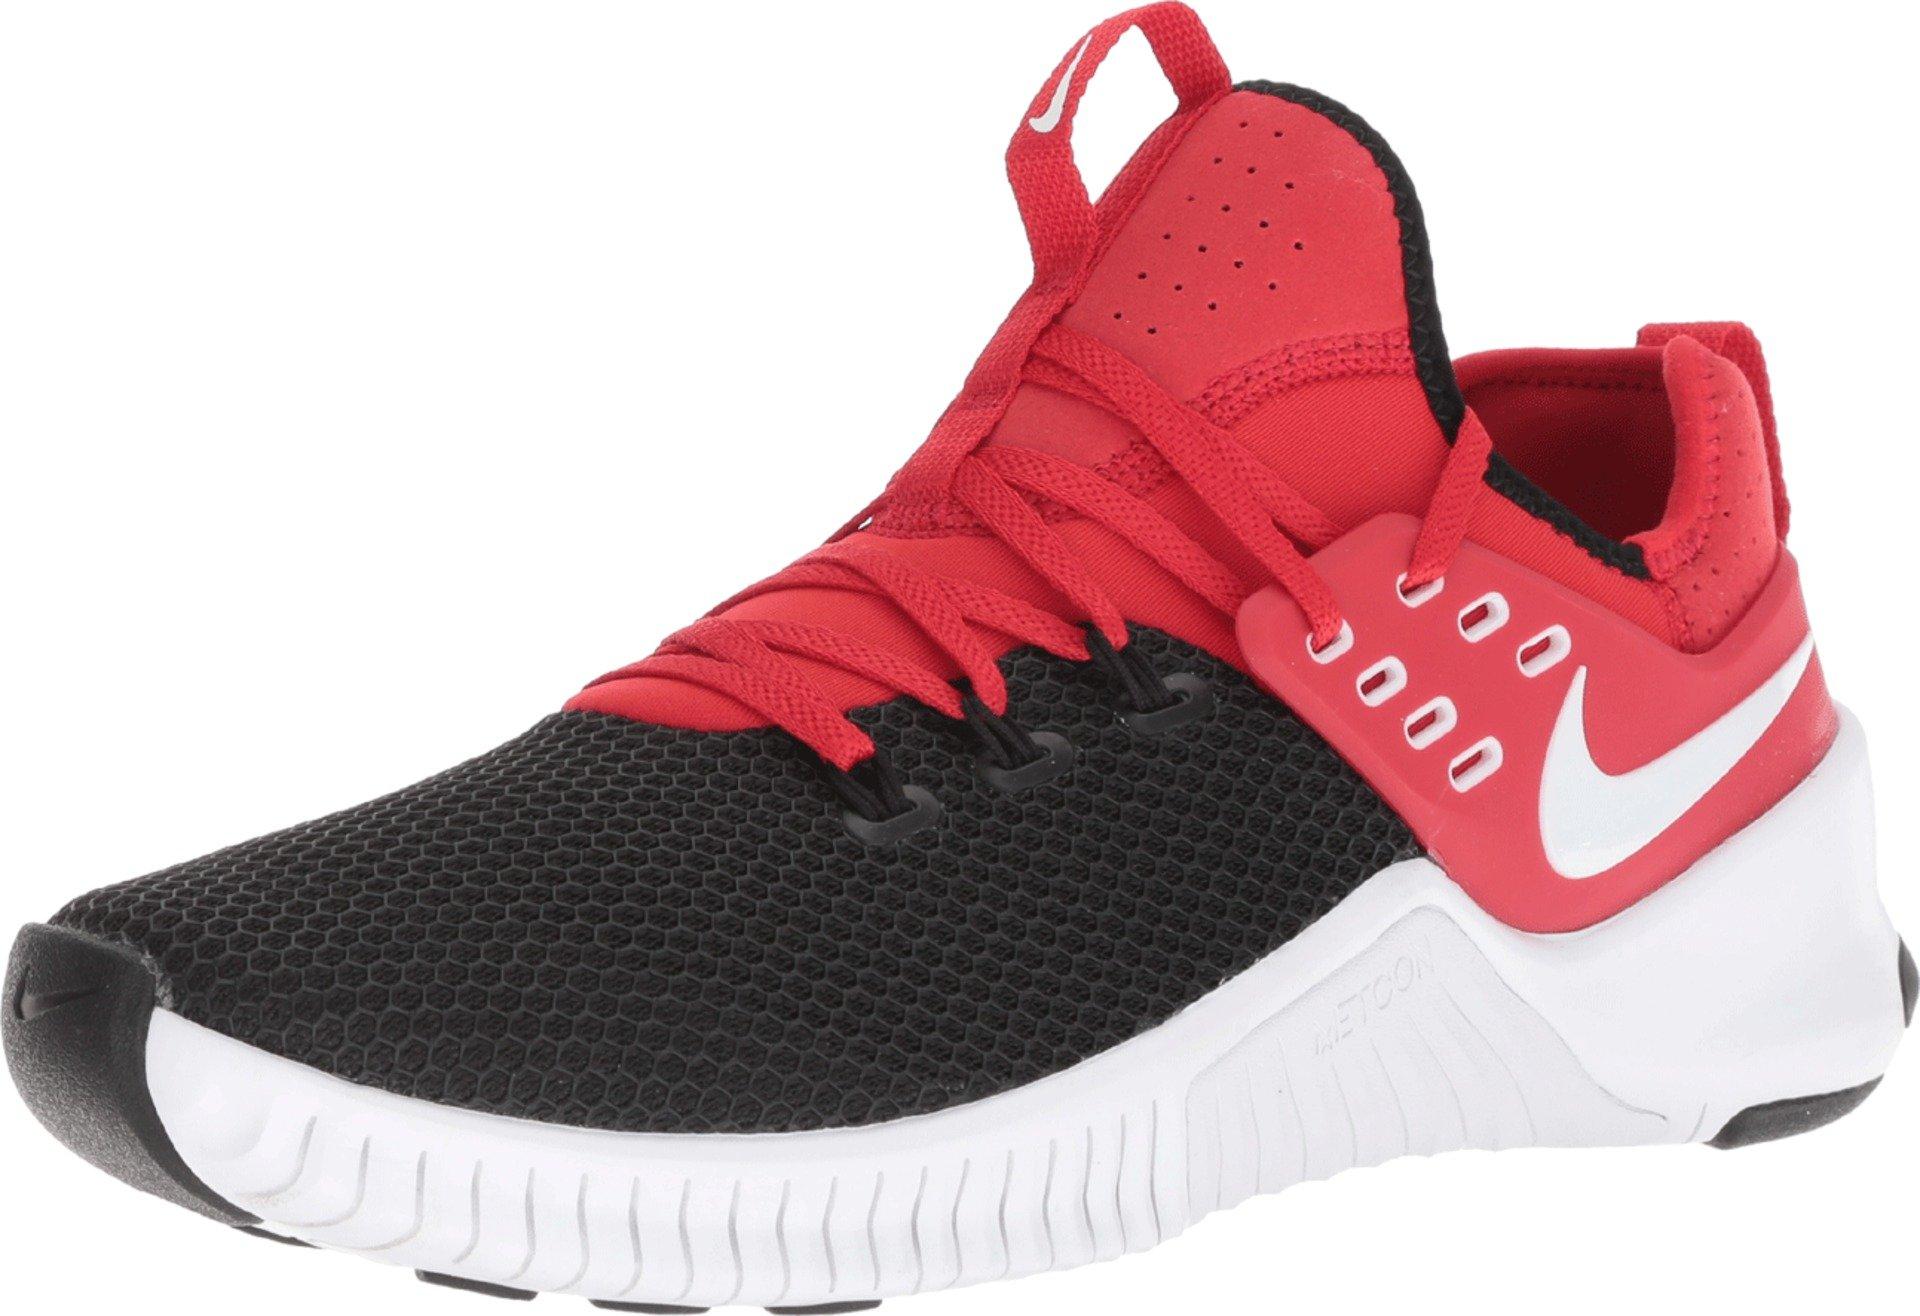 Nike Men's Free X Metcon Training Shoes (8-M, Red/White/Black)